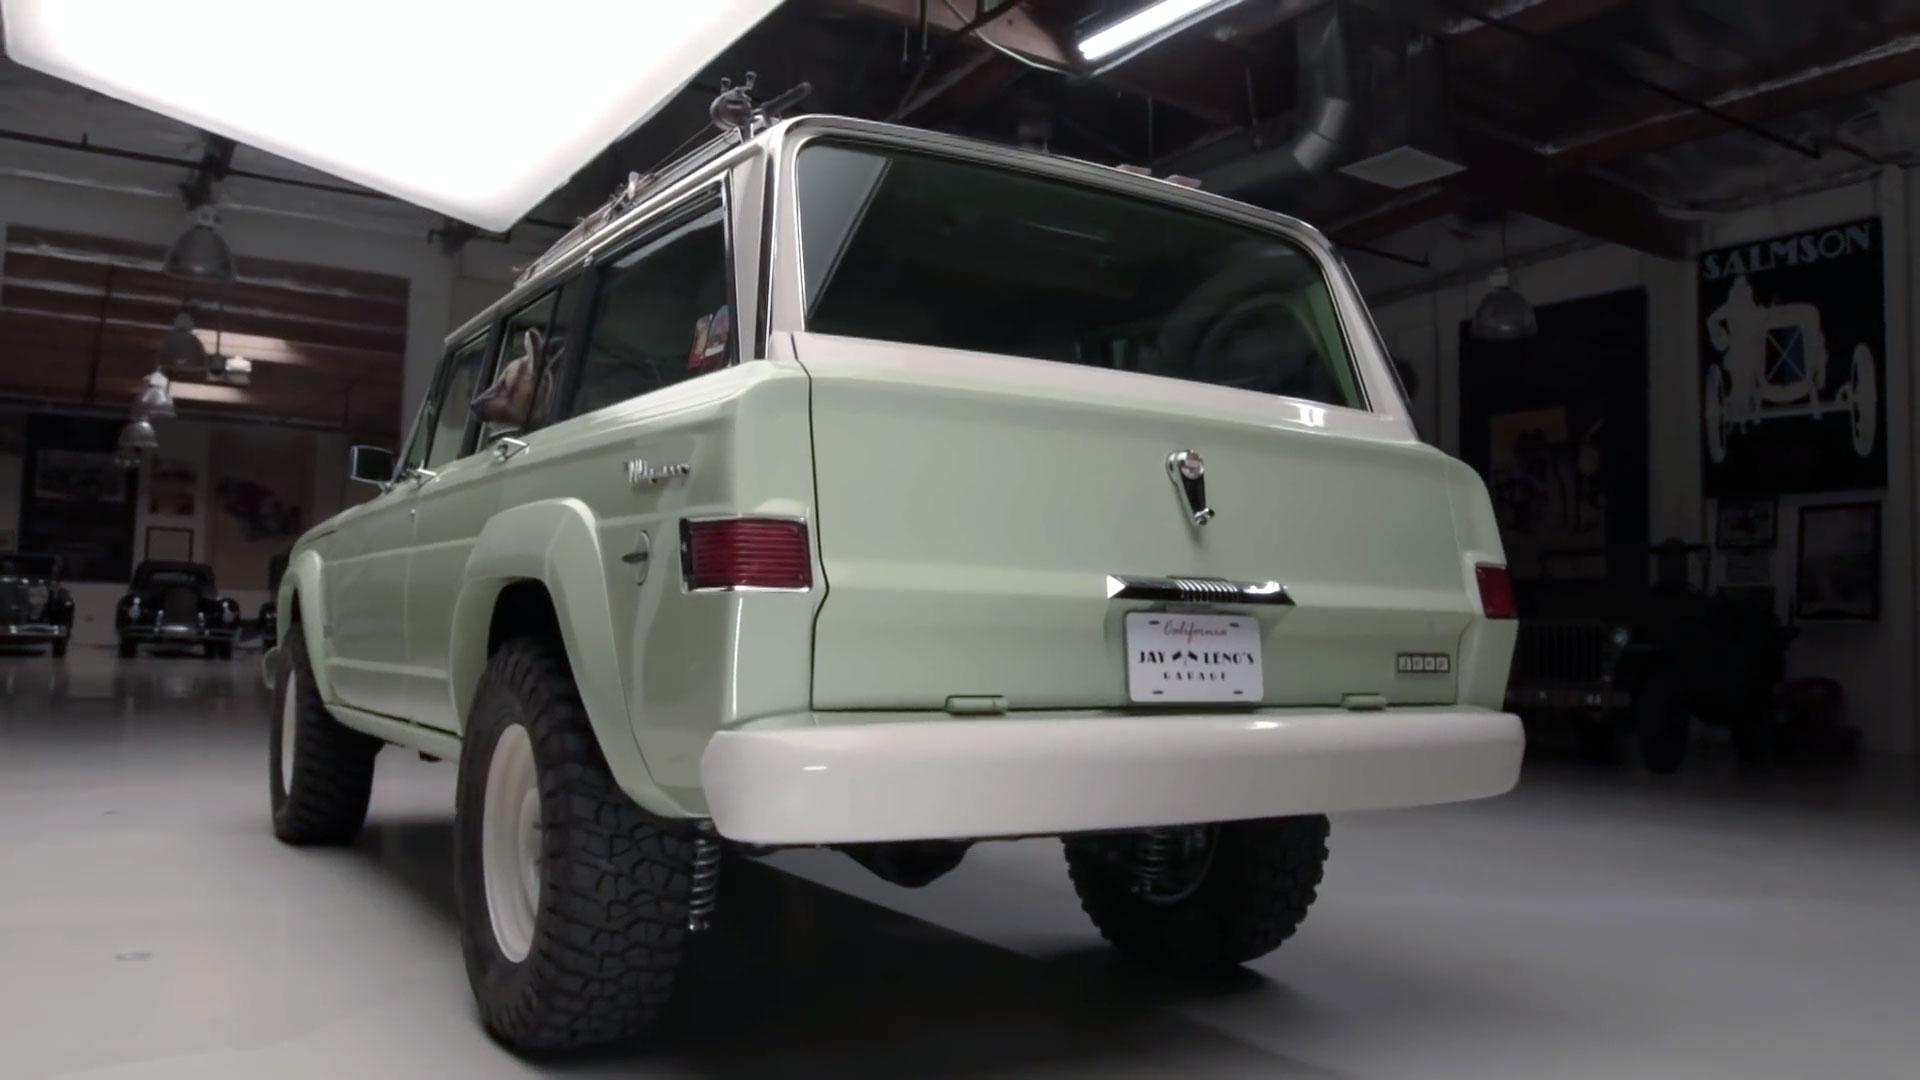 1965 Jeep Wagoneer Roadtrip Concept